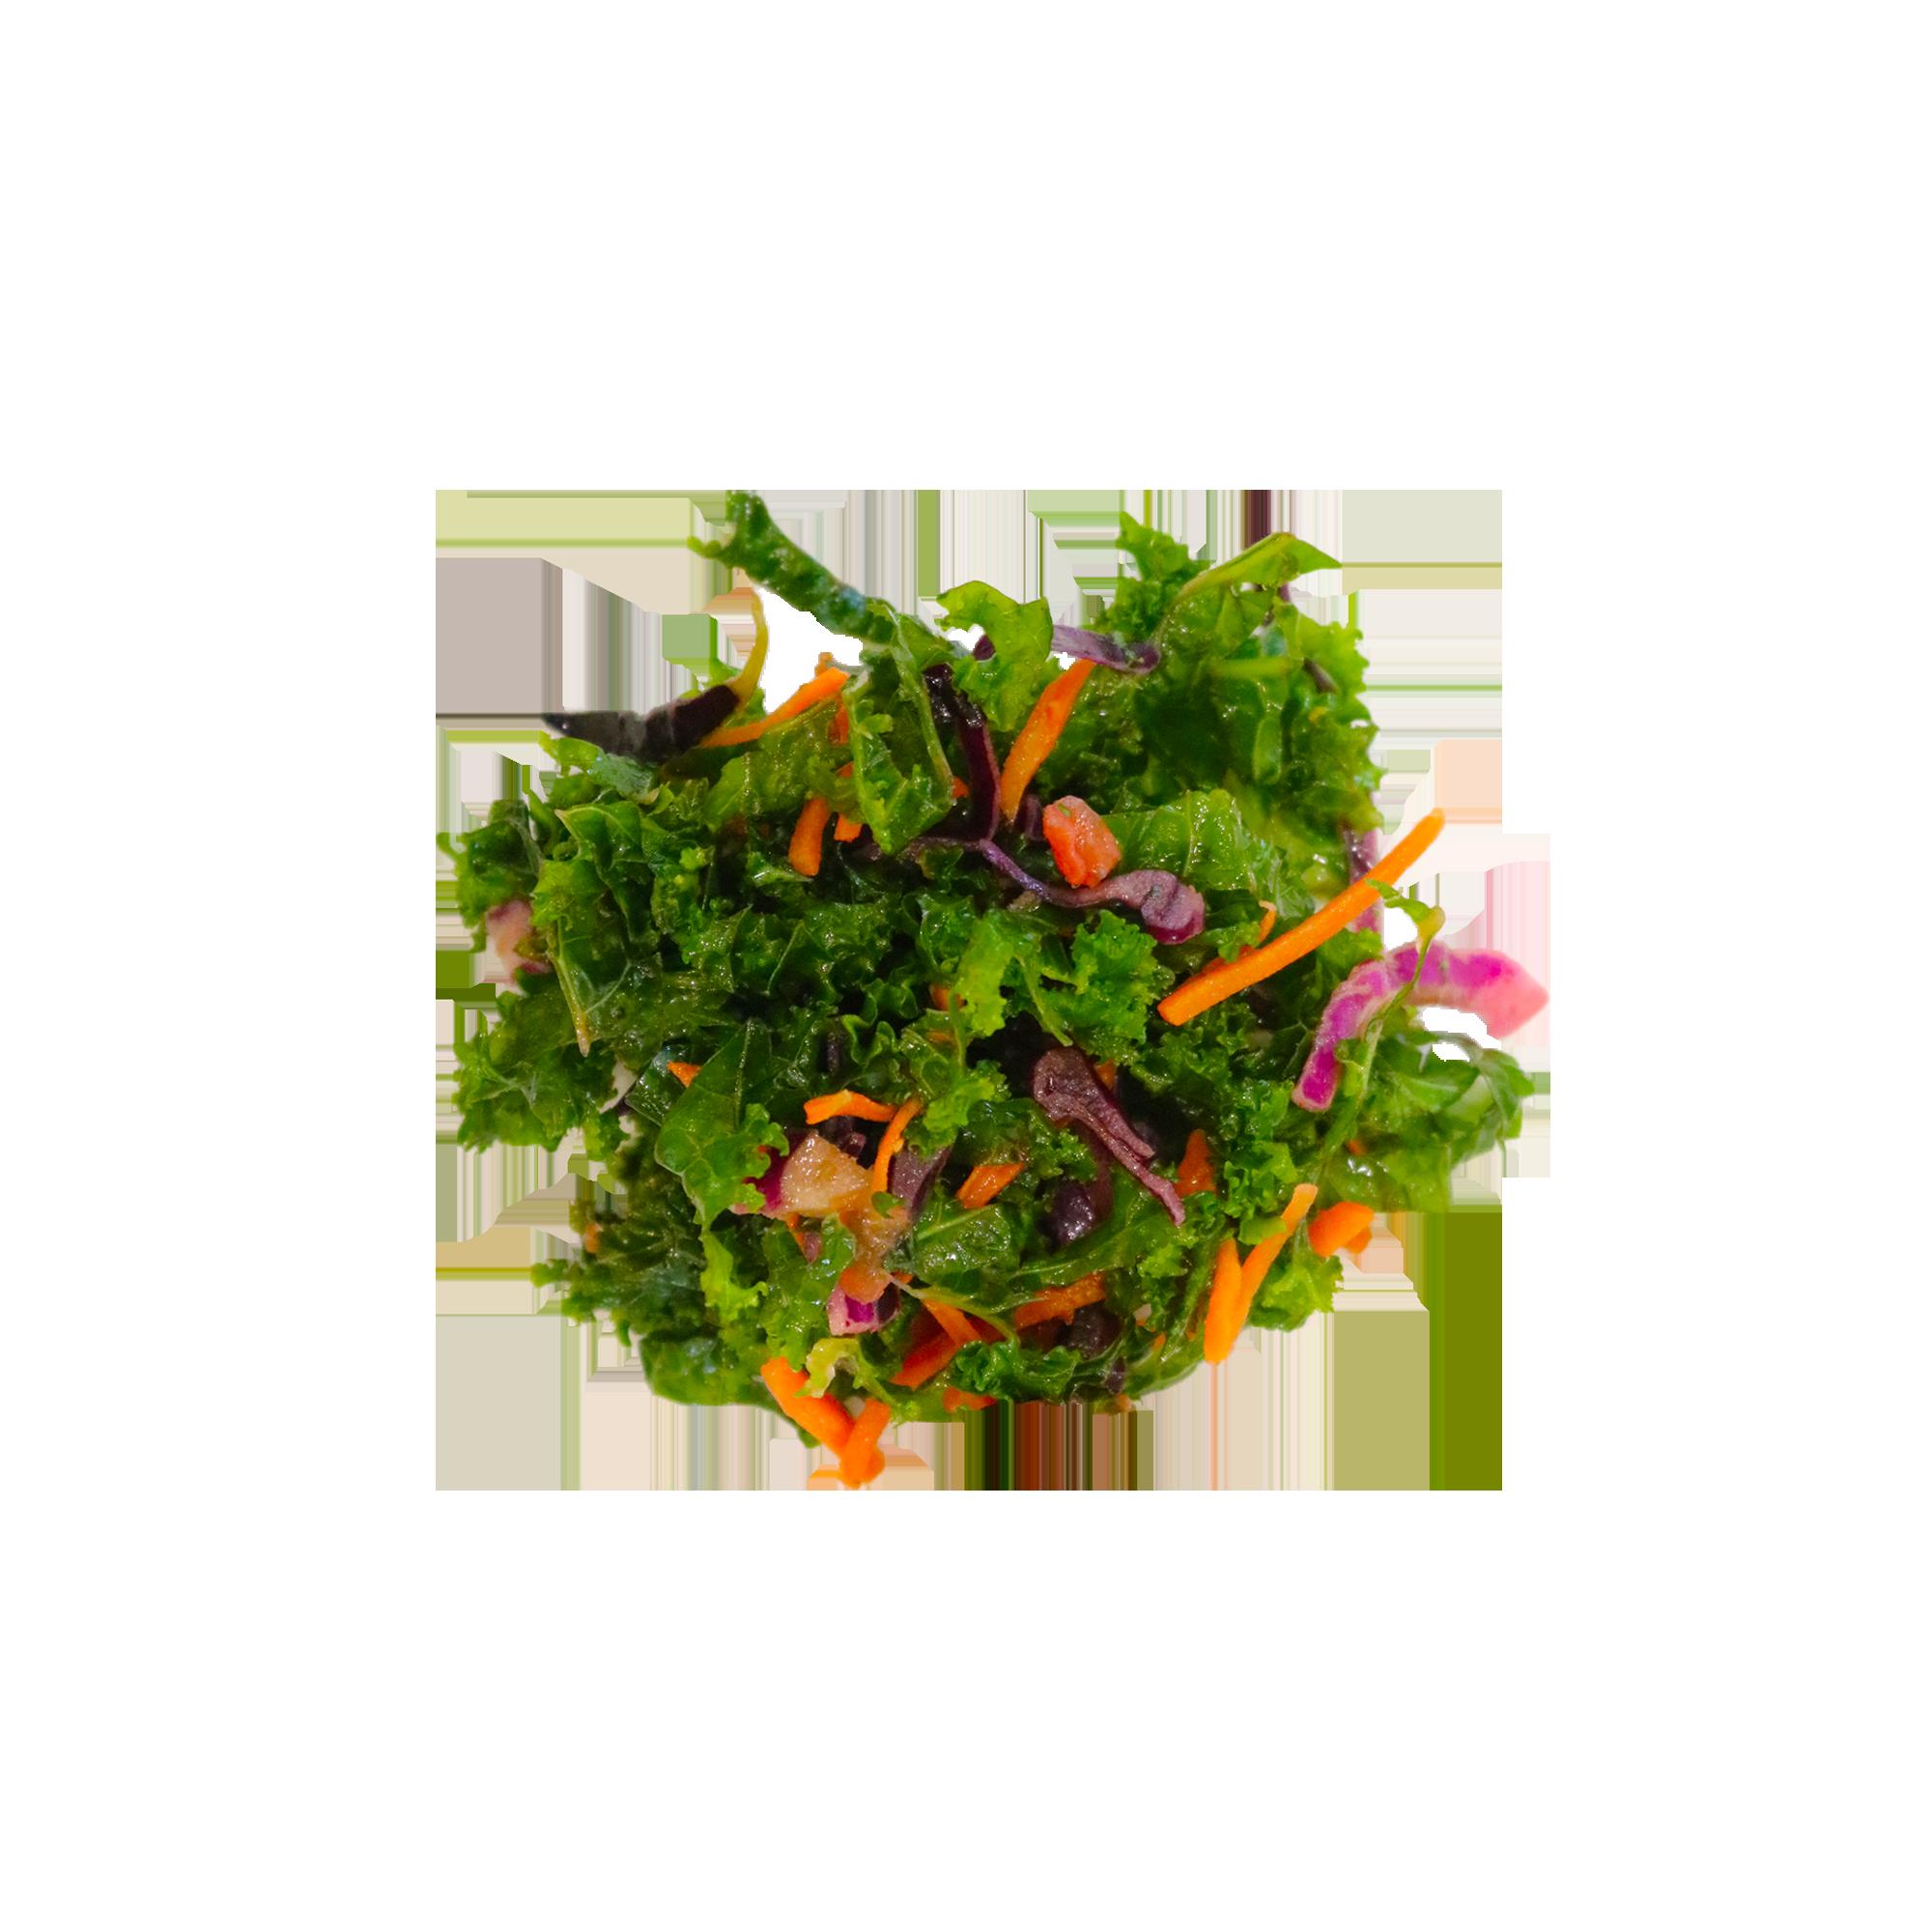 Pomegranate Kale Salad - A mixture of hand chopped tomato, kale, carrots, red cabbage with salad oil, lemon juice, pomegranate vinagret and a dash of salt.Vegan | Gluten- Free